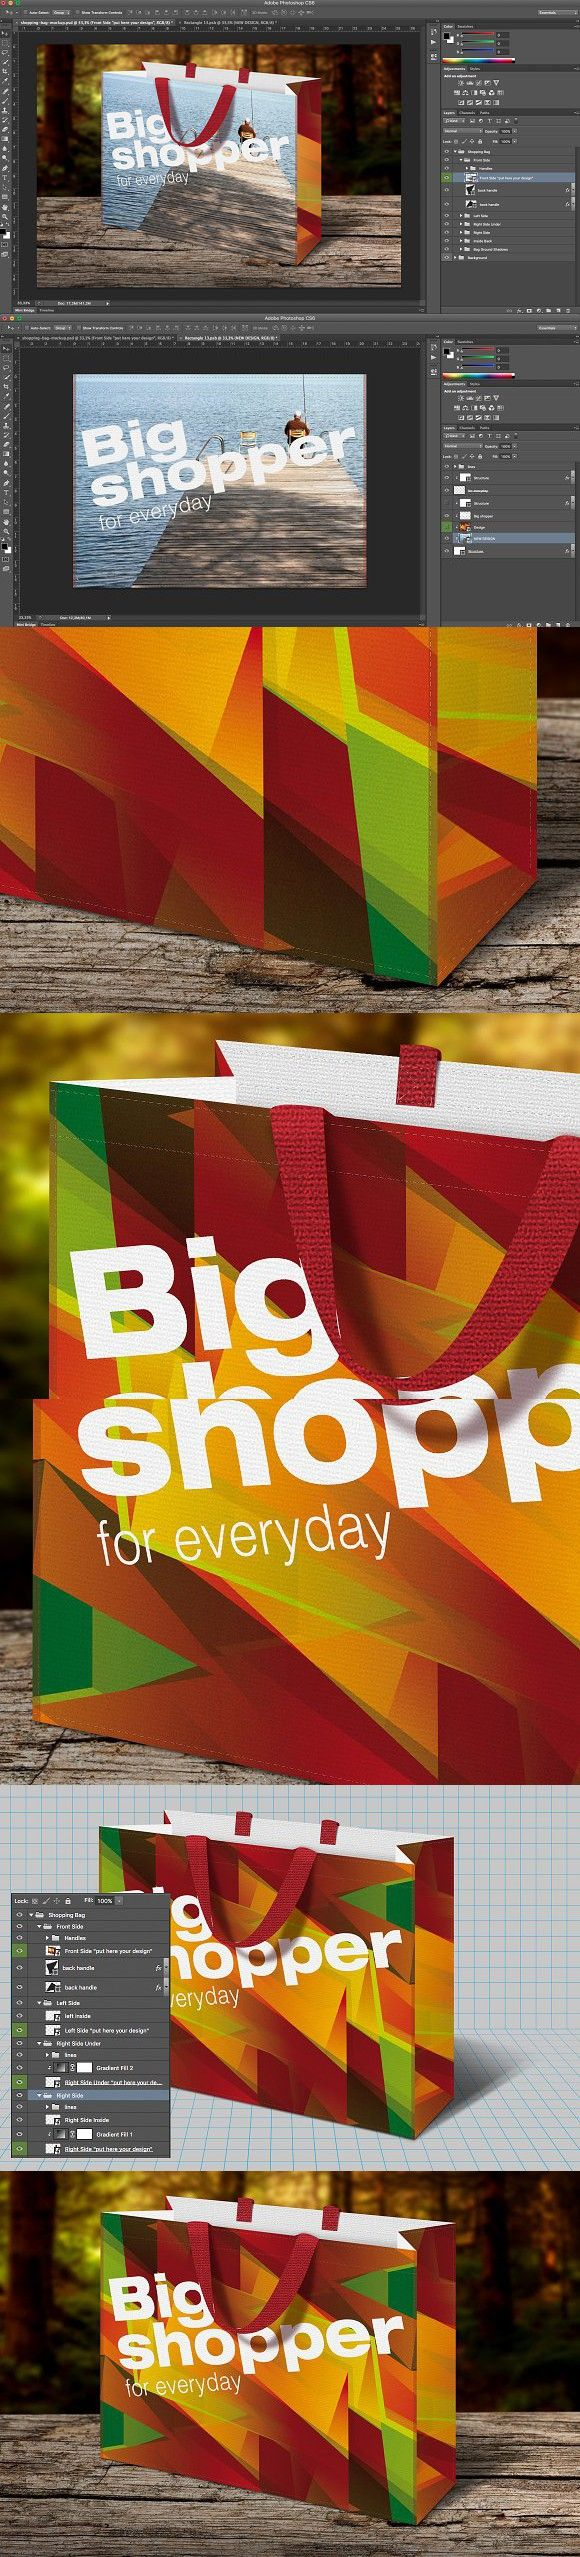 Shopping Bag Mockup Bag Mockup Bags Shopping Bag